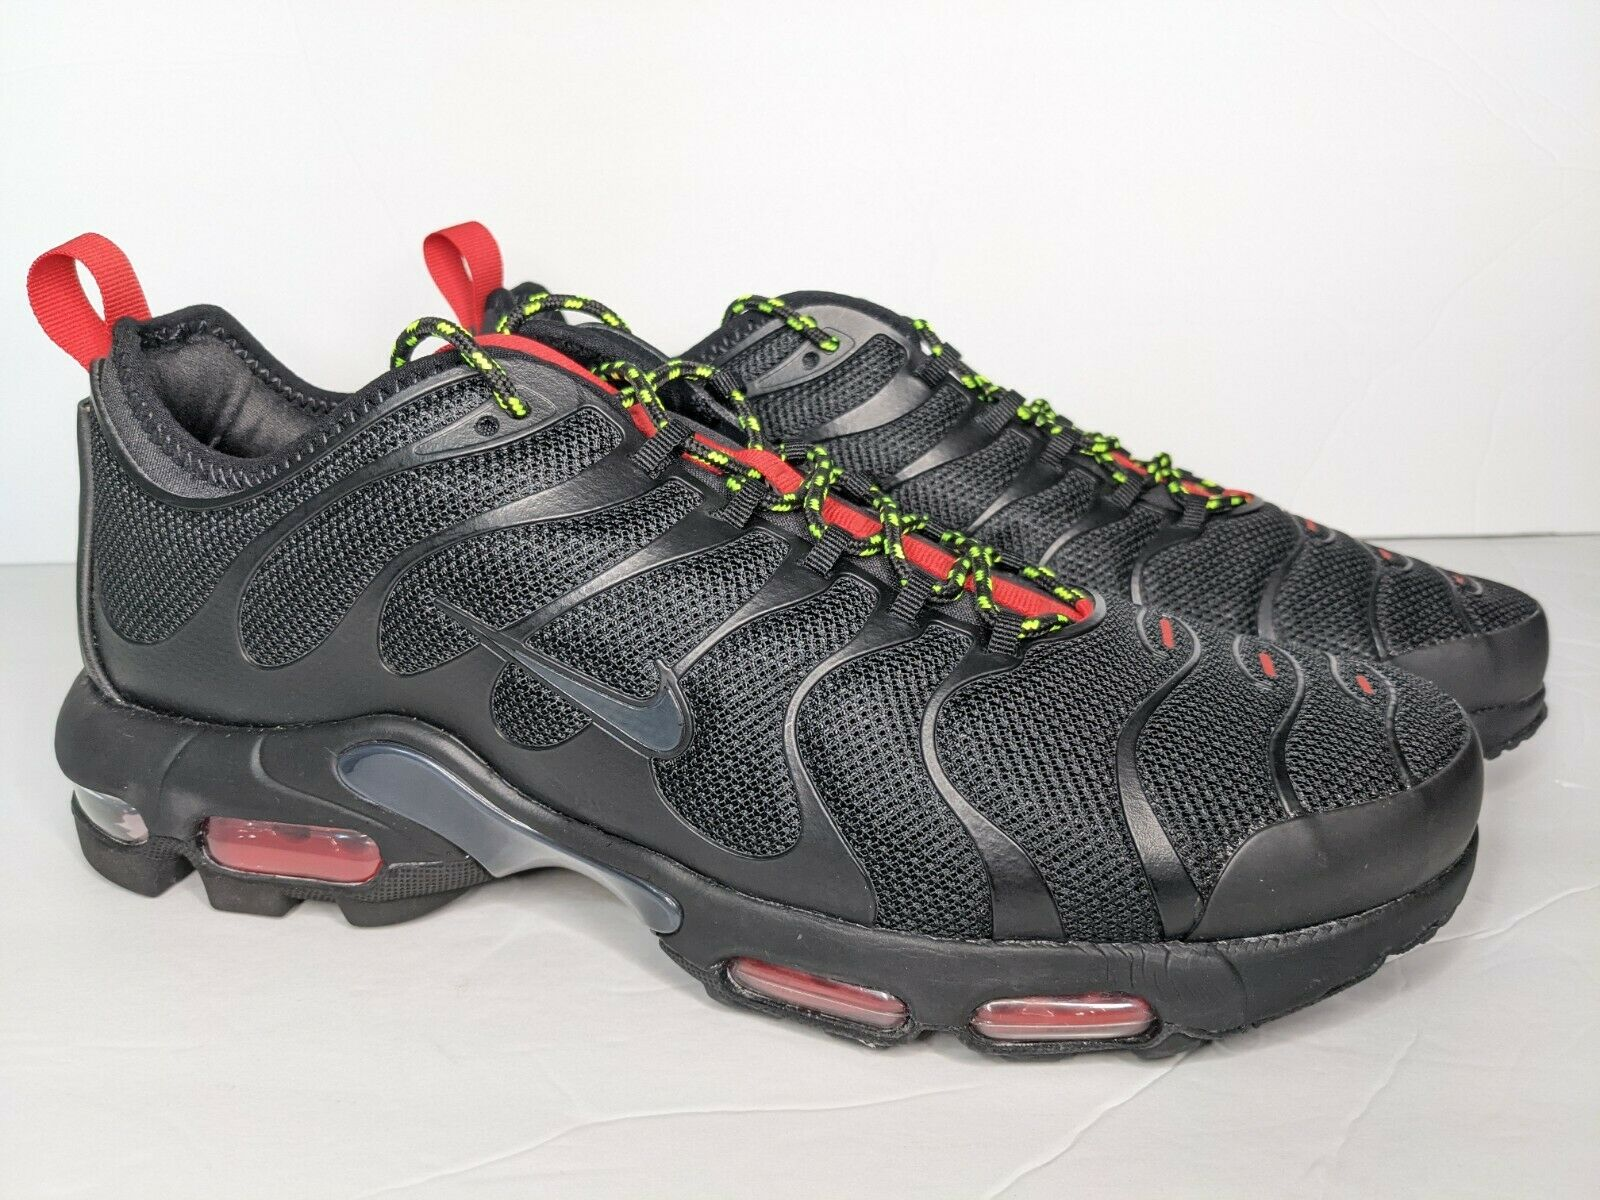 mentiroso cola vestíbulo  Nike Air Max Plus TN Ultra Black University Red Volt Mens Size 10 Ar4234  002 for sale online   eBay